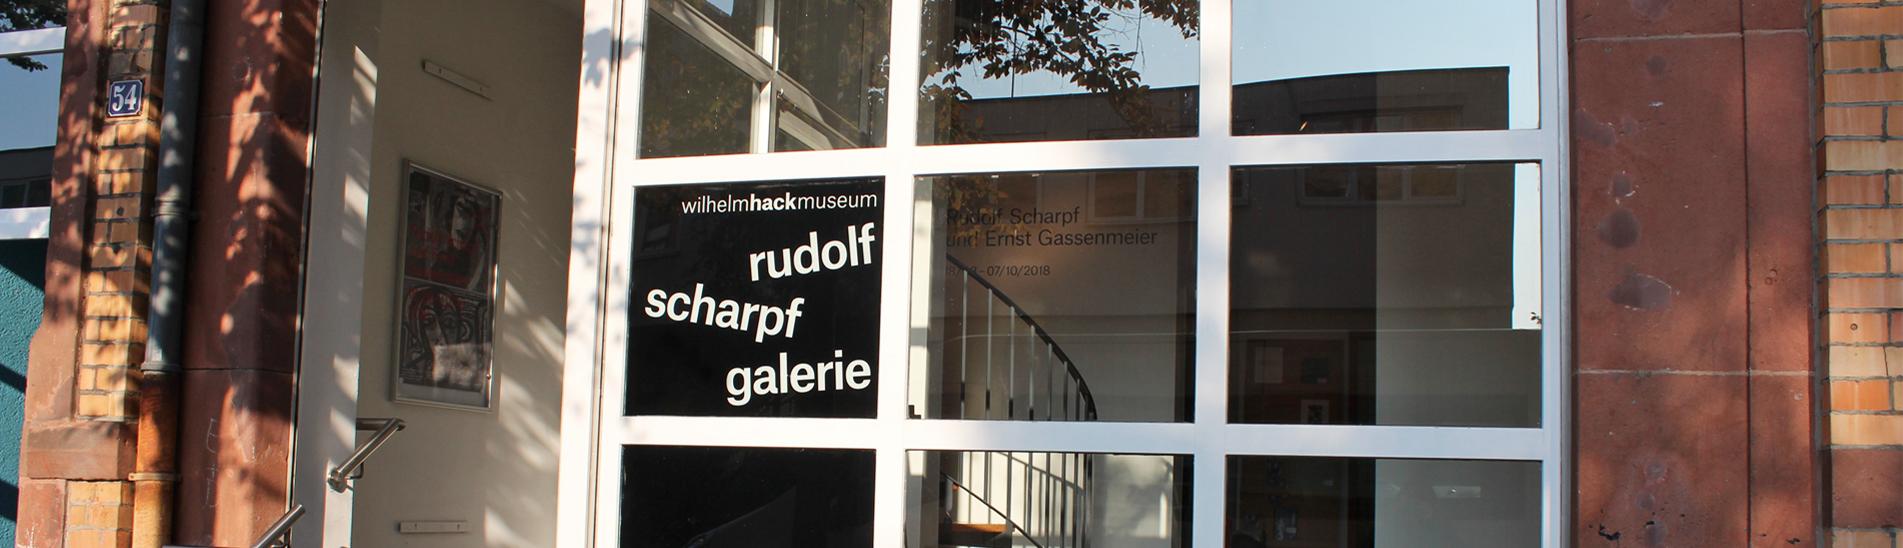 Rudolf Scharpf Galerie widescreen